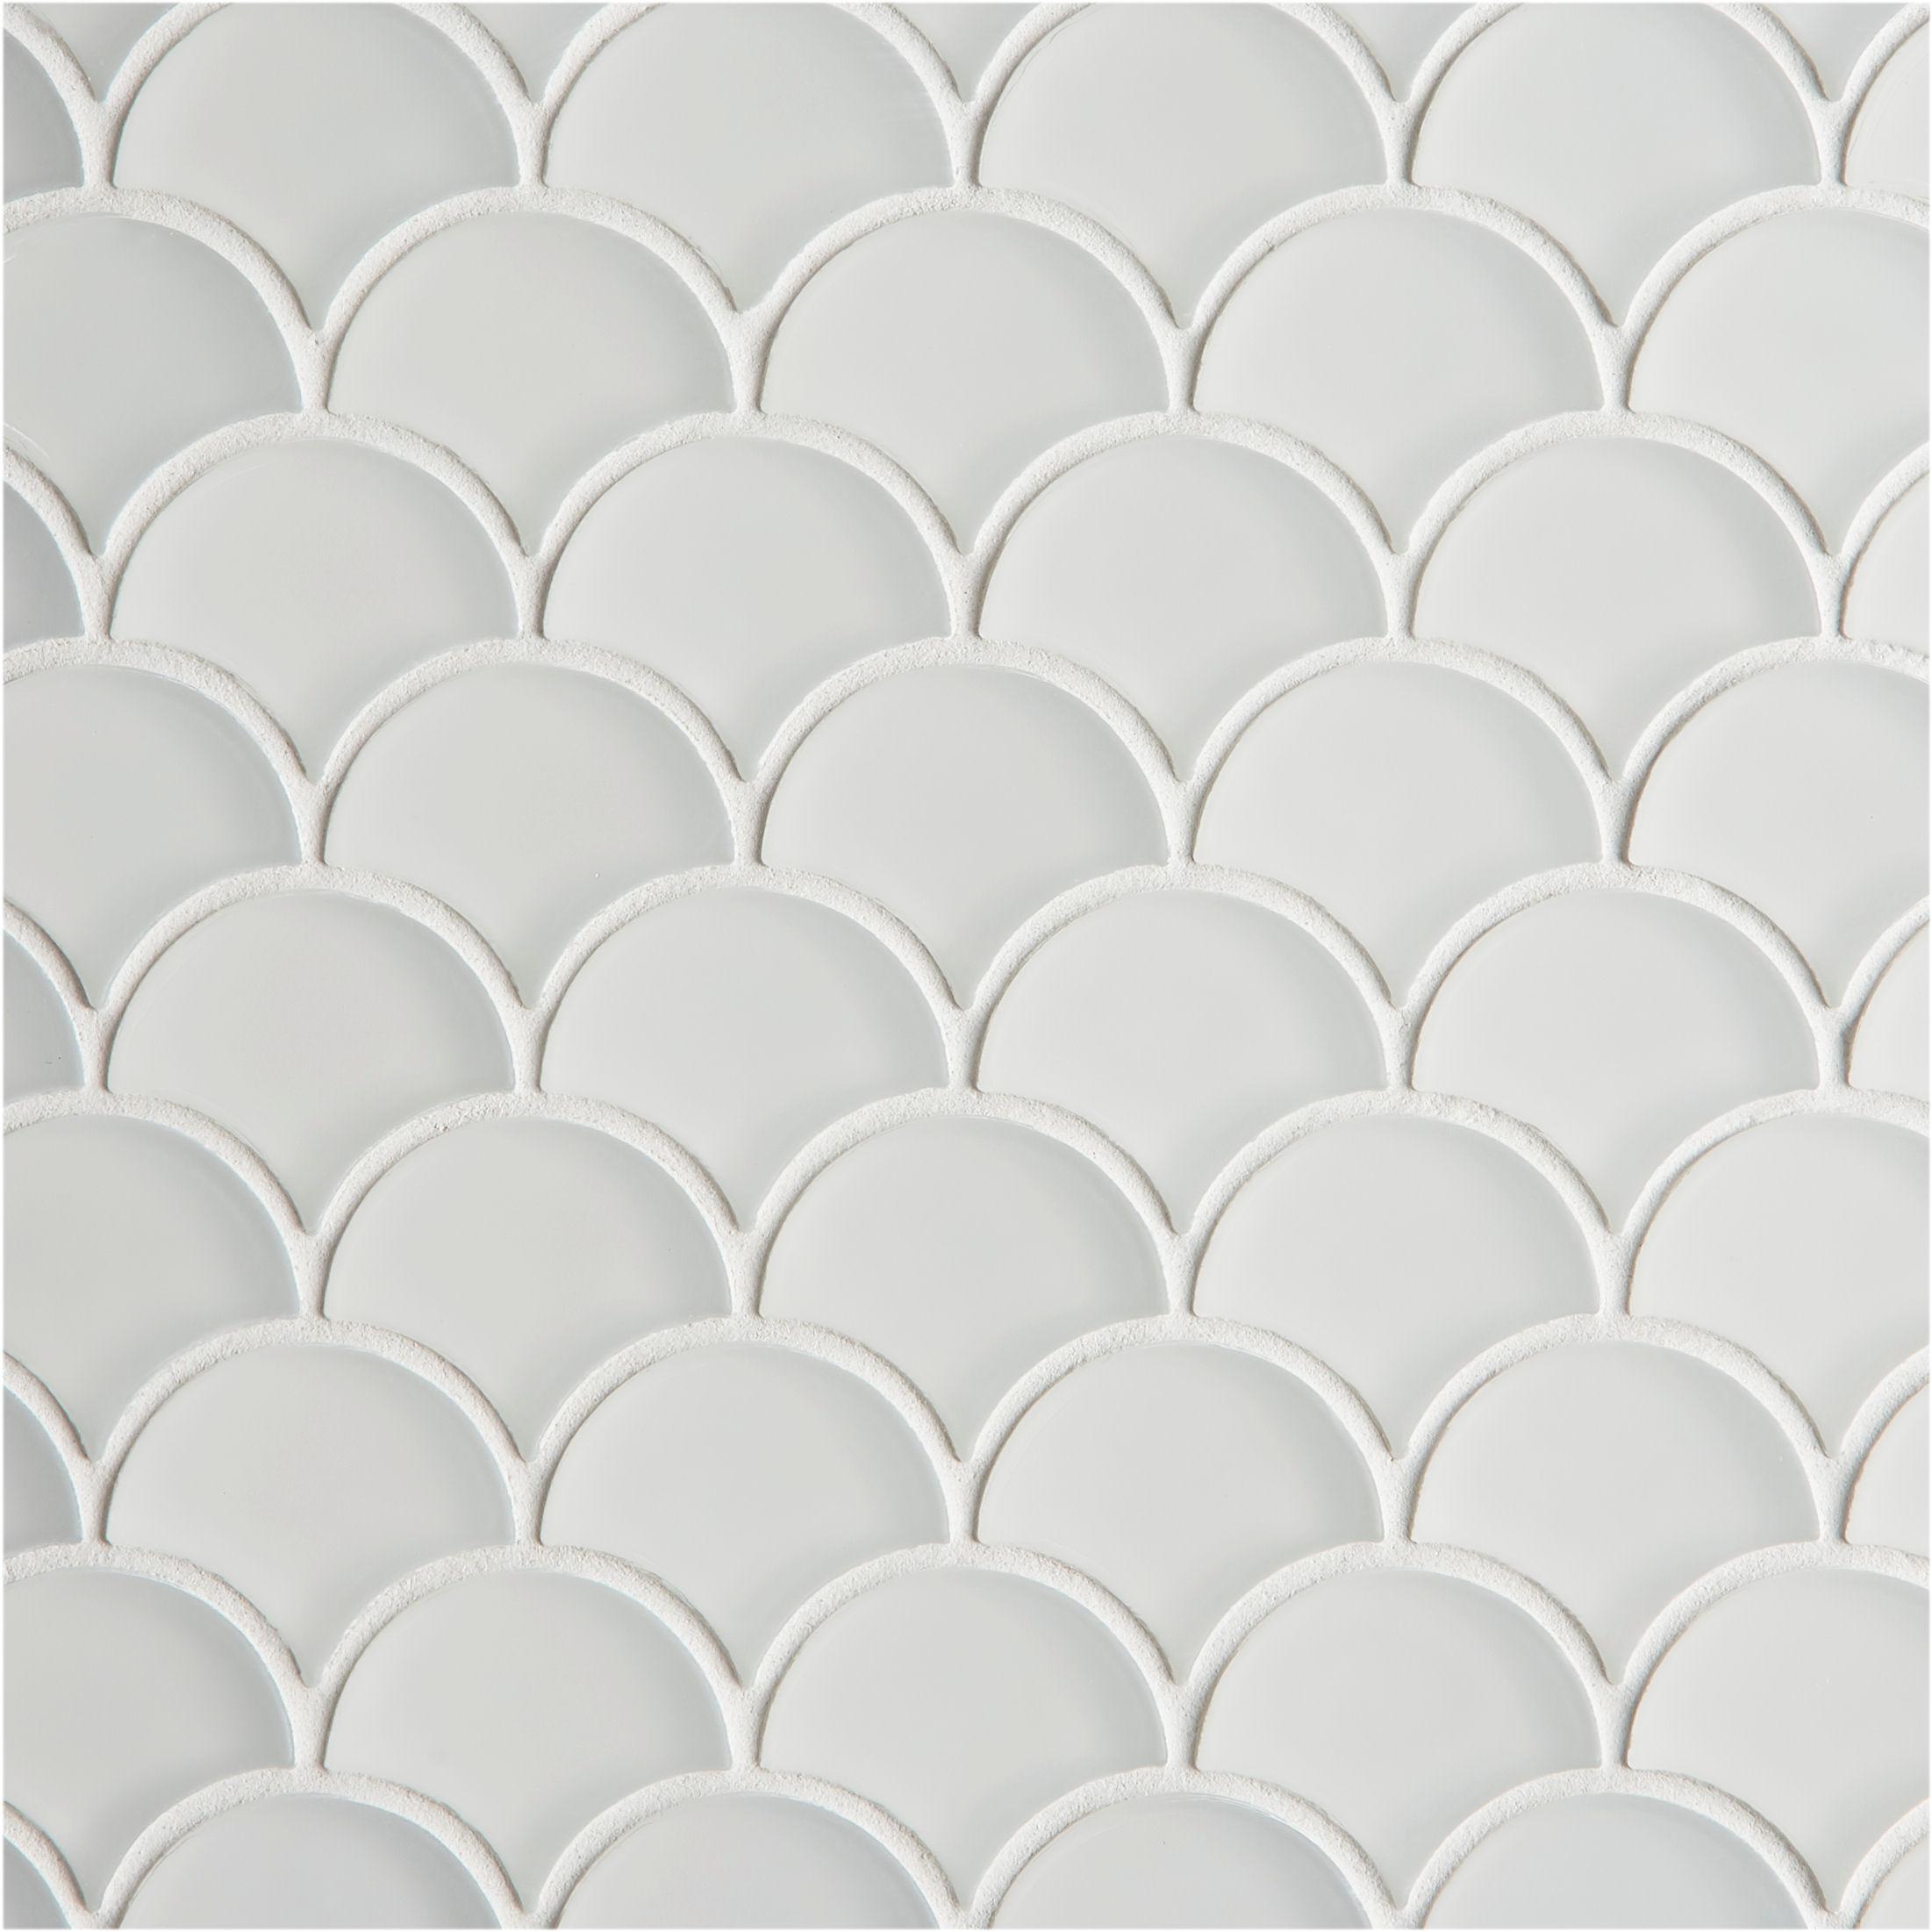 glacier white glass scallop mosaic tiles mandarin stone